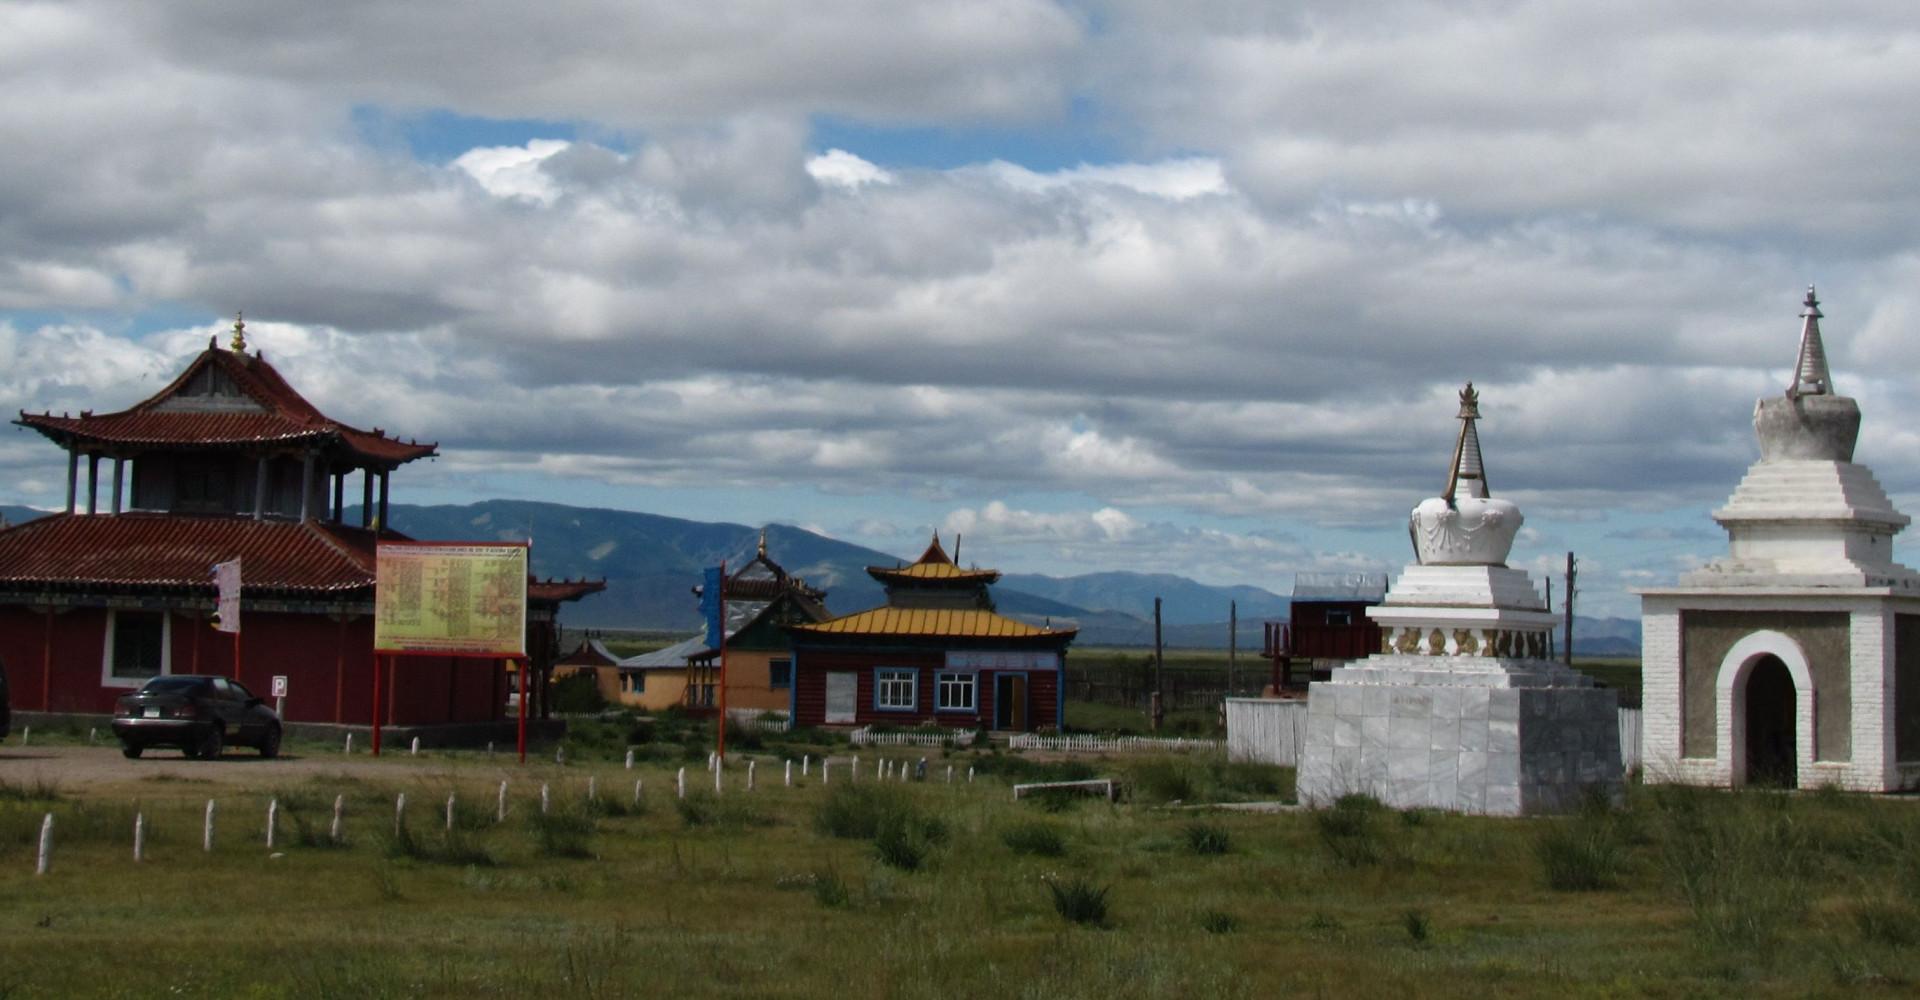 Gandandarjaalin monastery